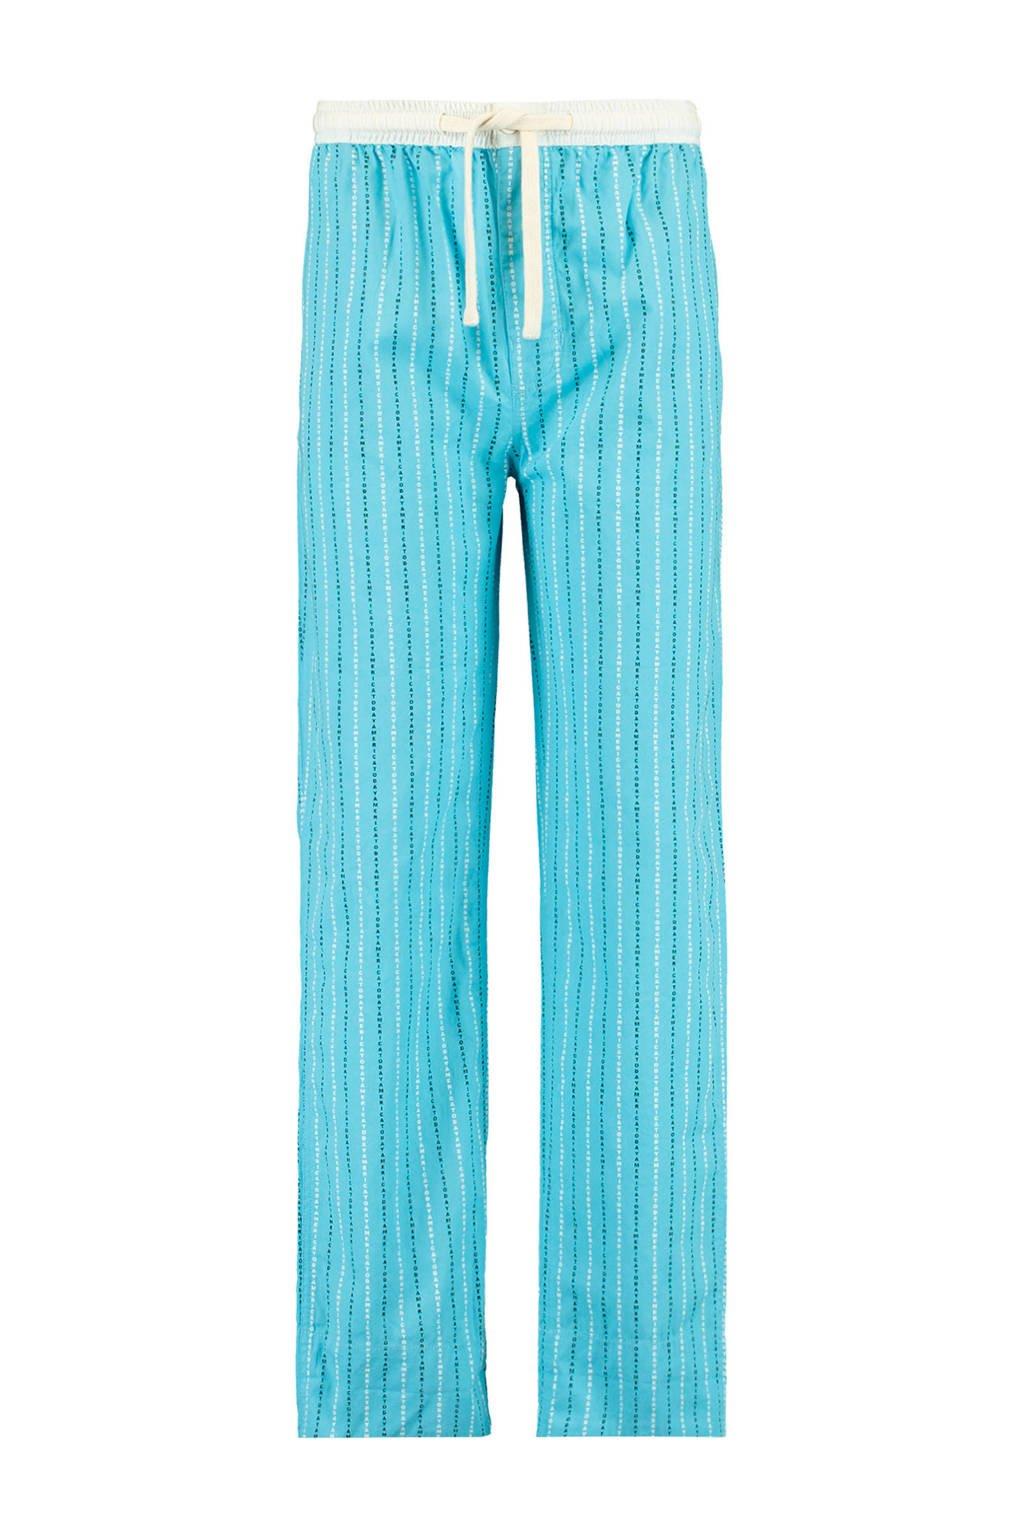 America Today Junior pyjamabroek Lake met all over print blauw, Blauw